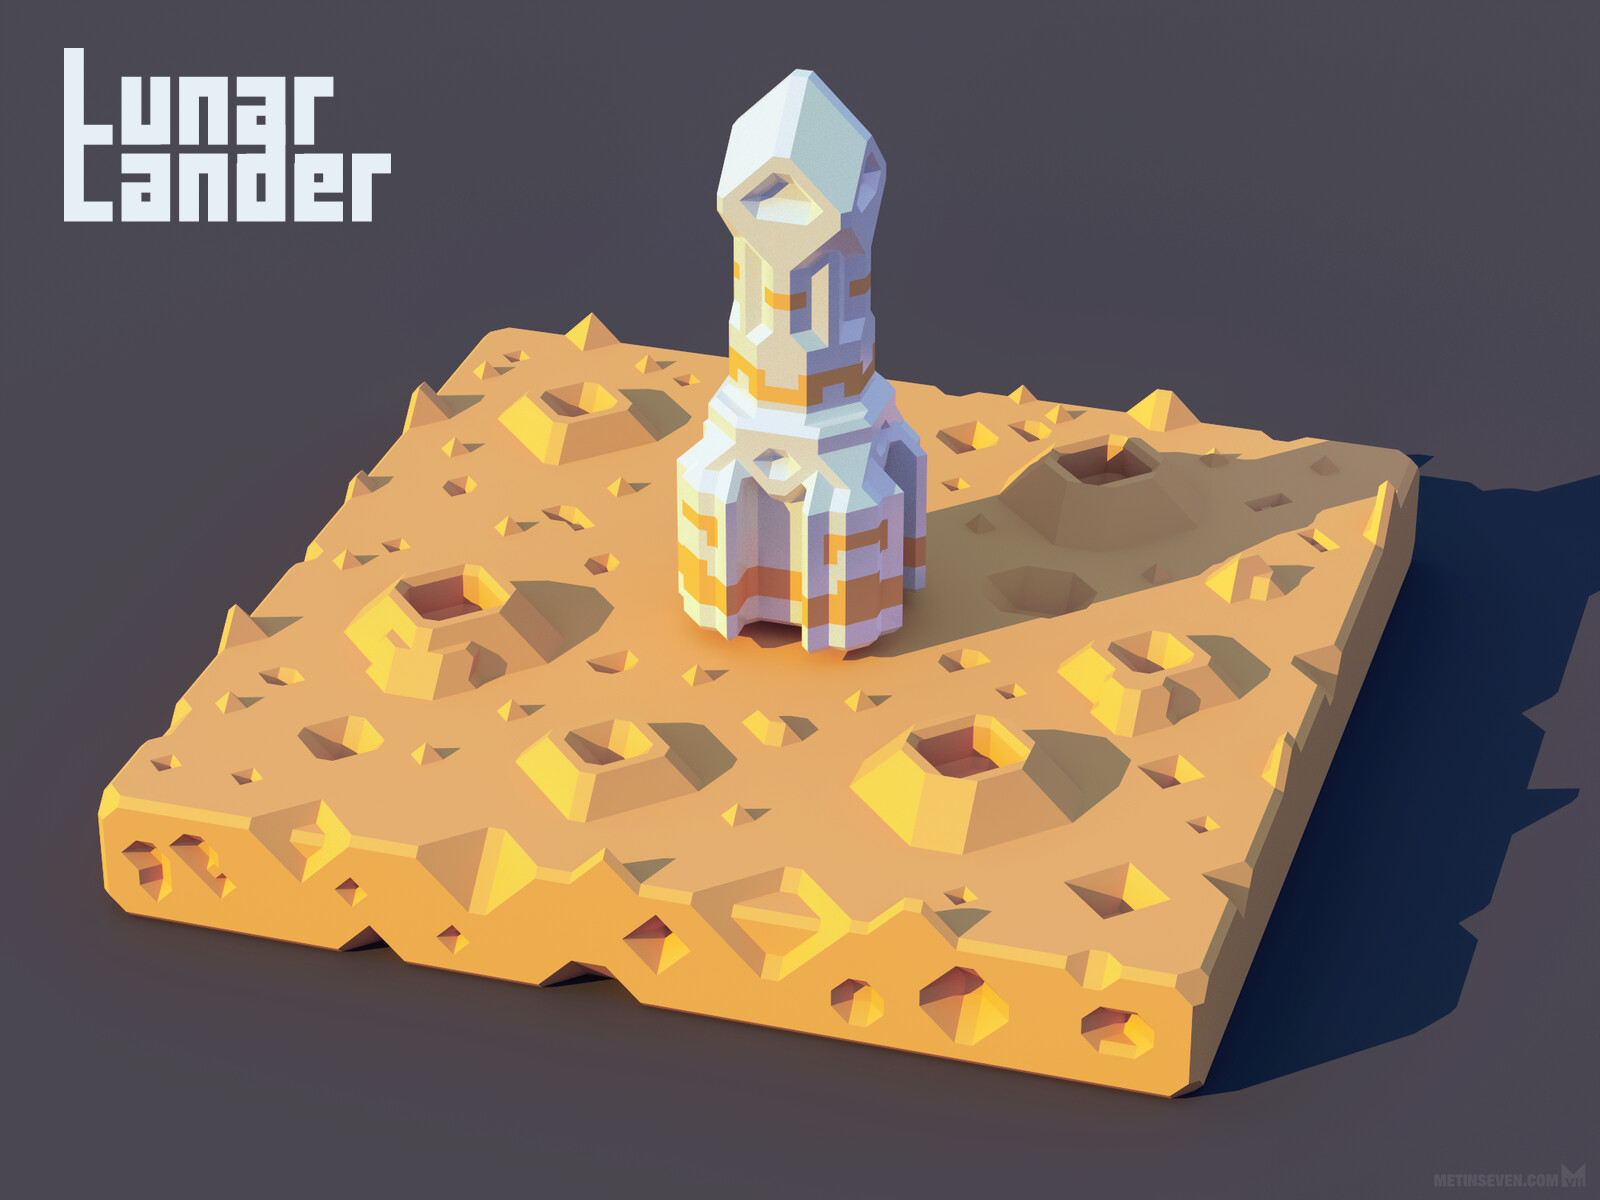 Low-polygon 3D artwork